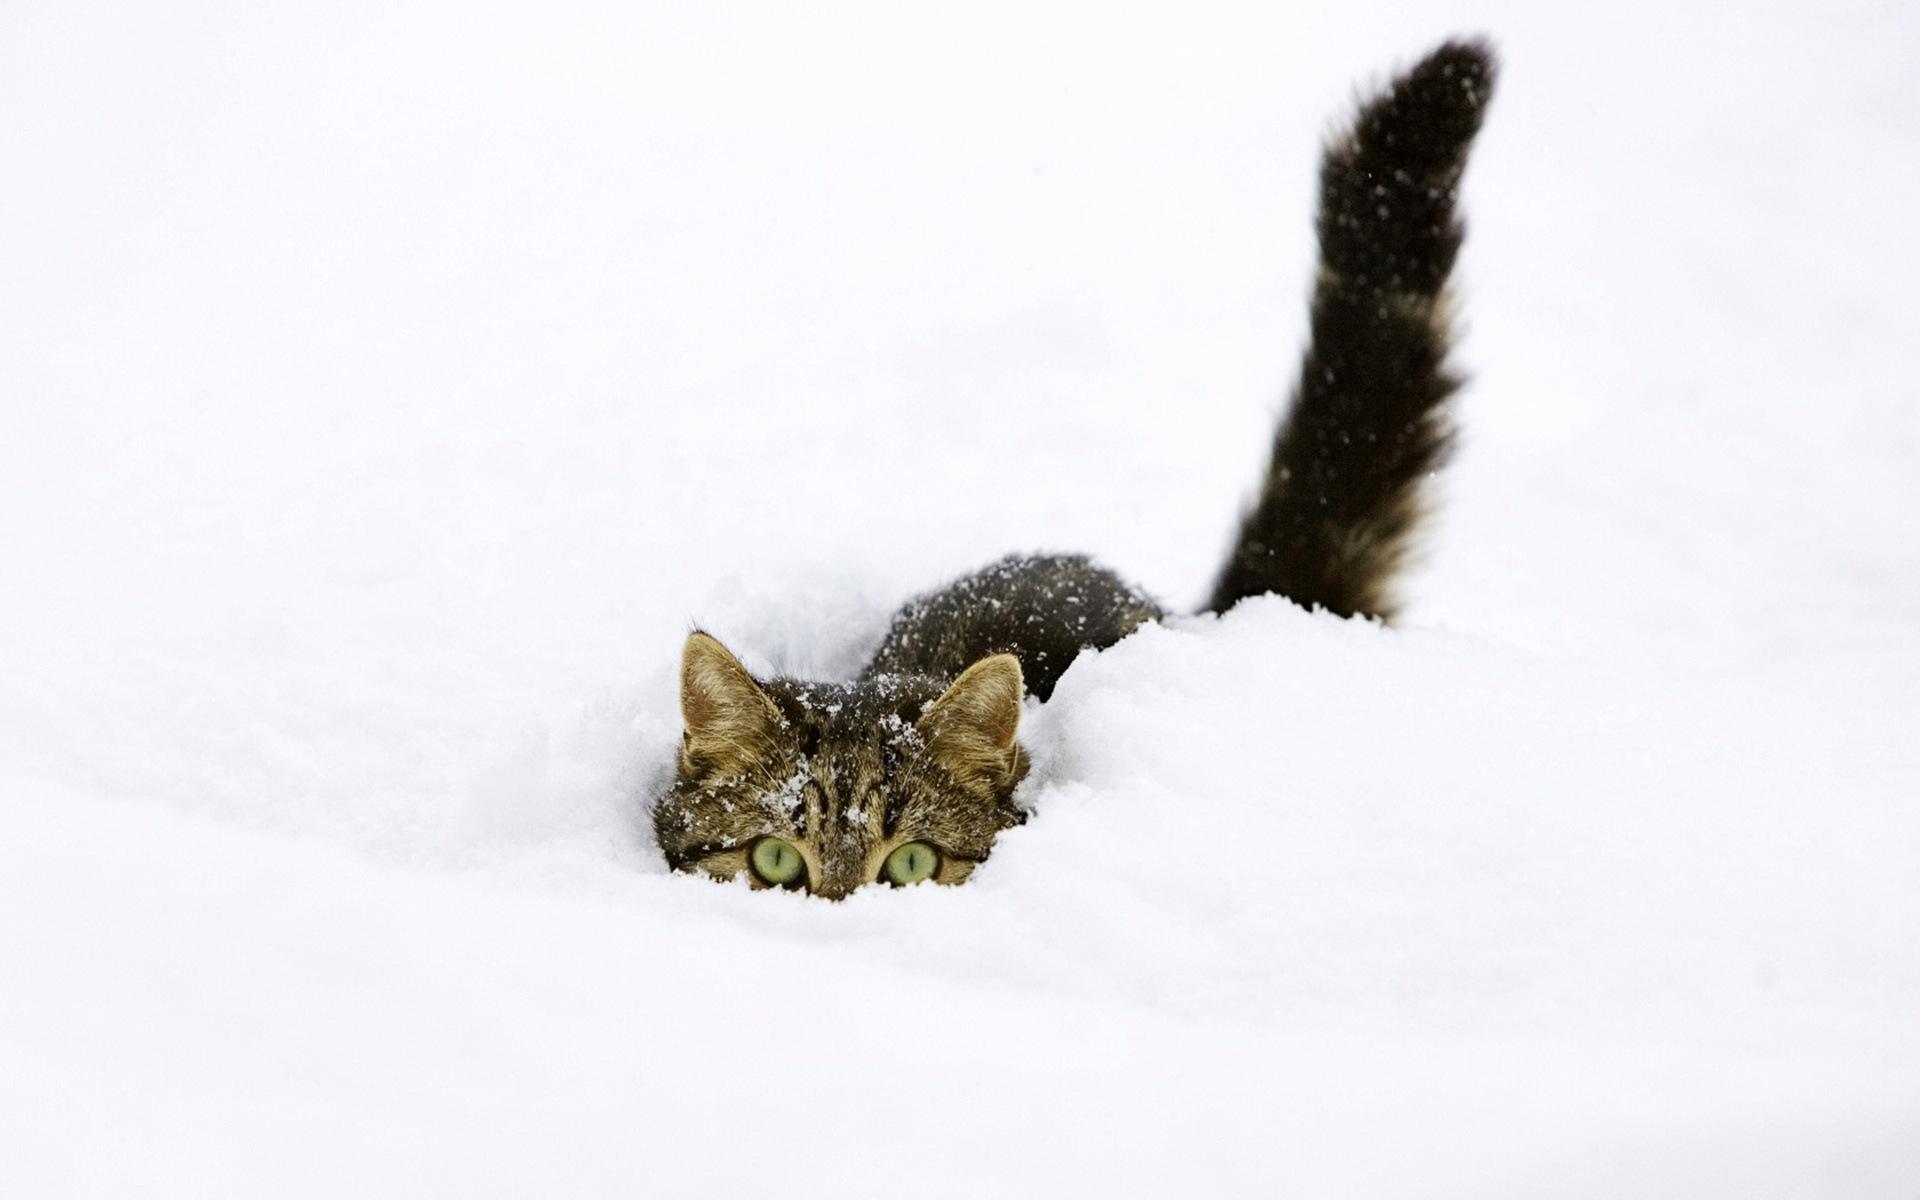 47431 Заставки и Обои Кошки (Коты, Котики) на телефон. Скачать Кошки (Коты, Котики), Животные, Зима, Снег картинки бесплатно